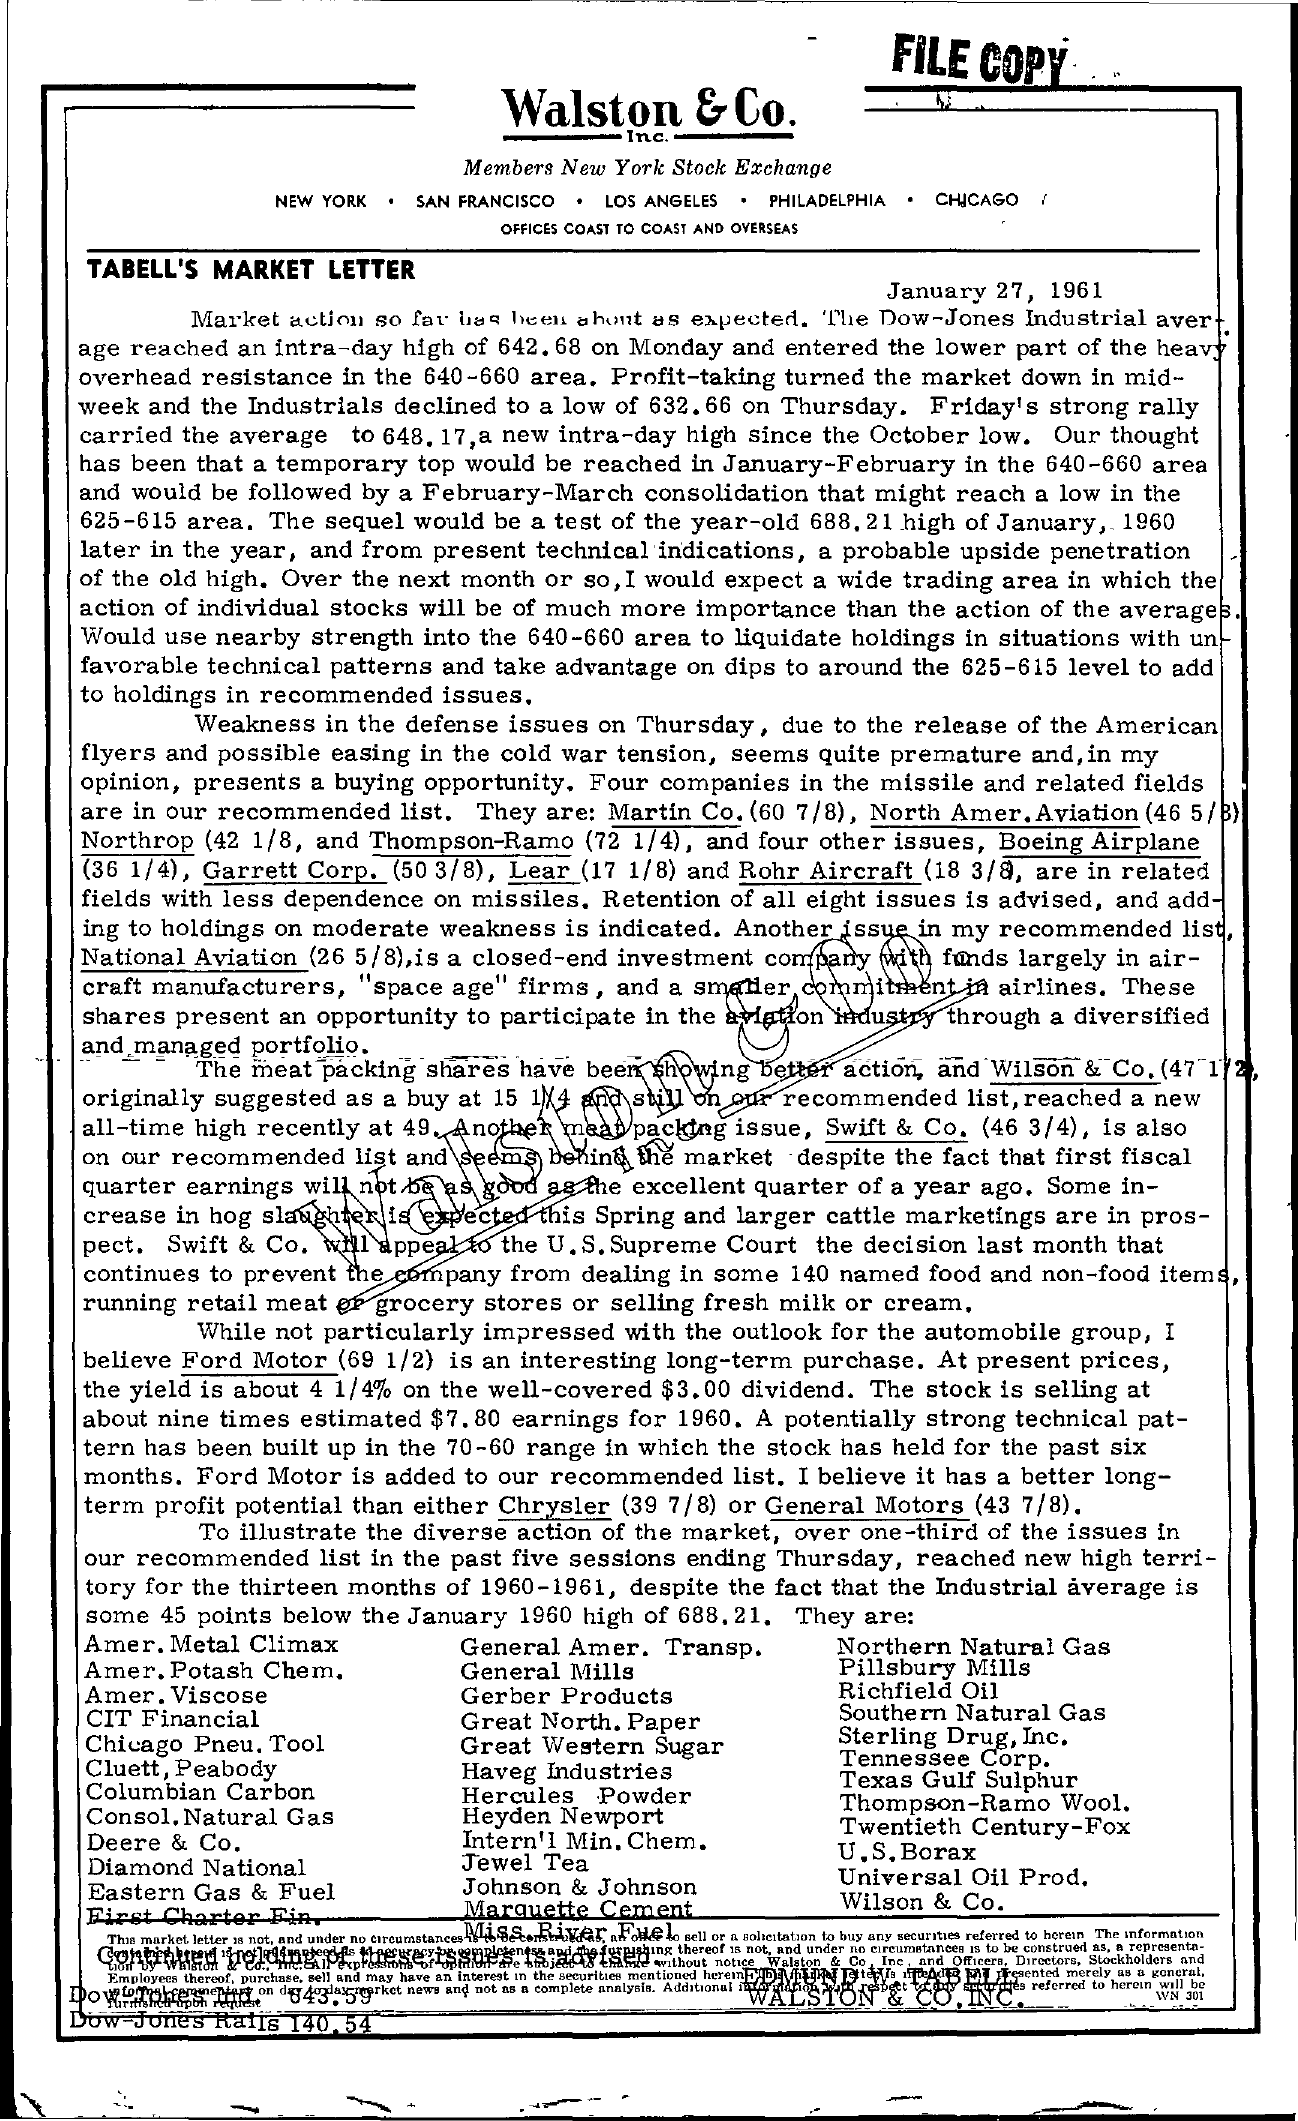 Tabell's Market Letter - January 27, 1961